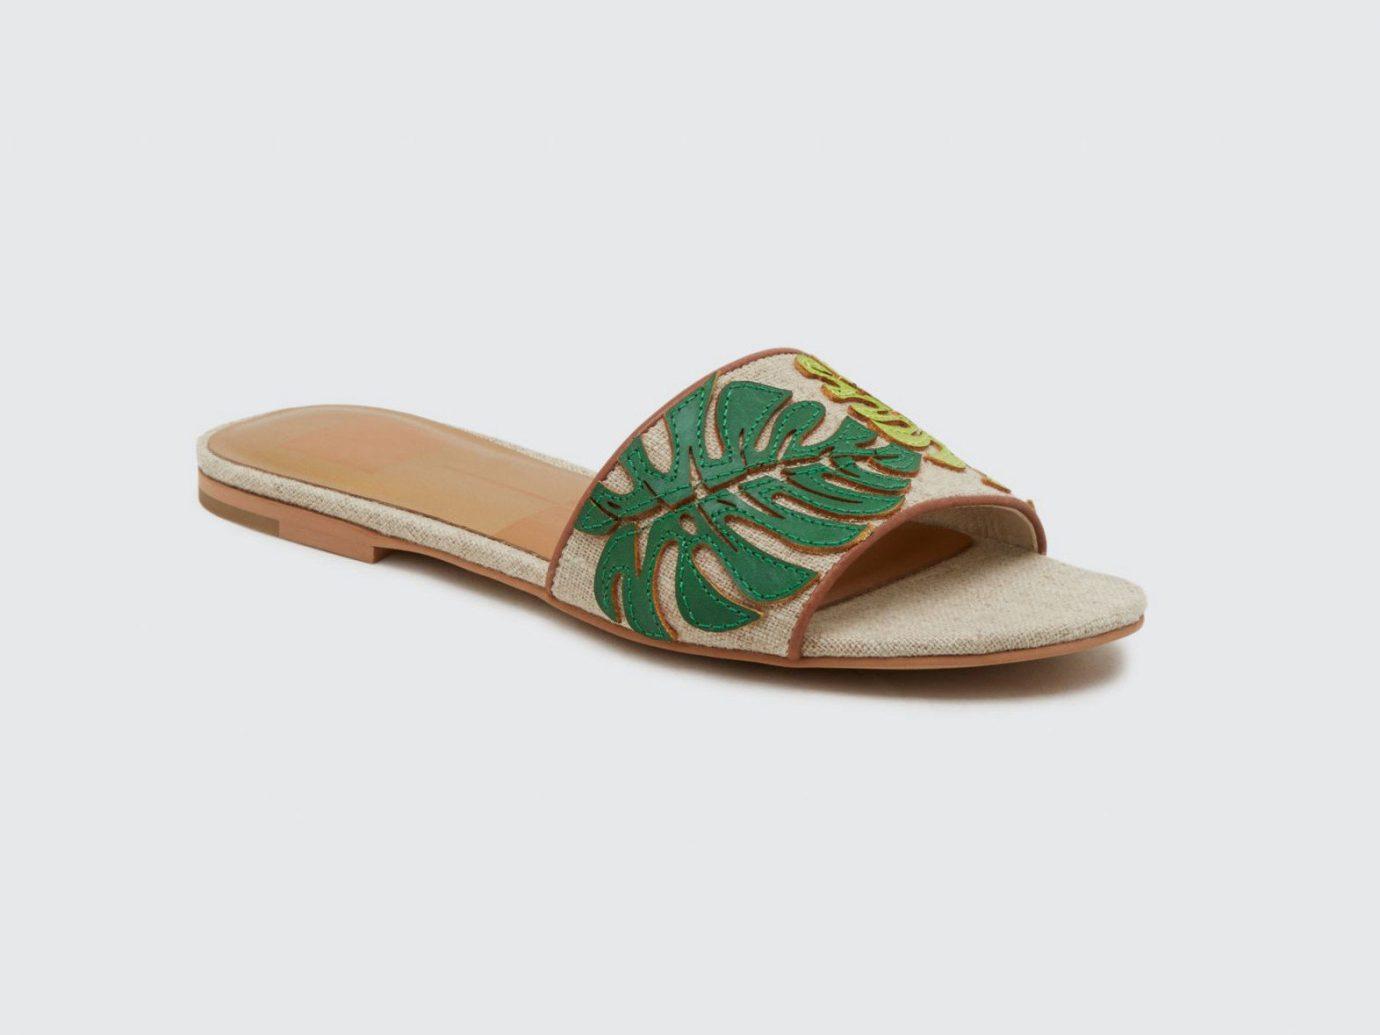 Style + Design footwear shoe sandal outdoor shoe beige product design